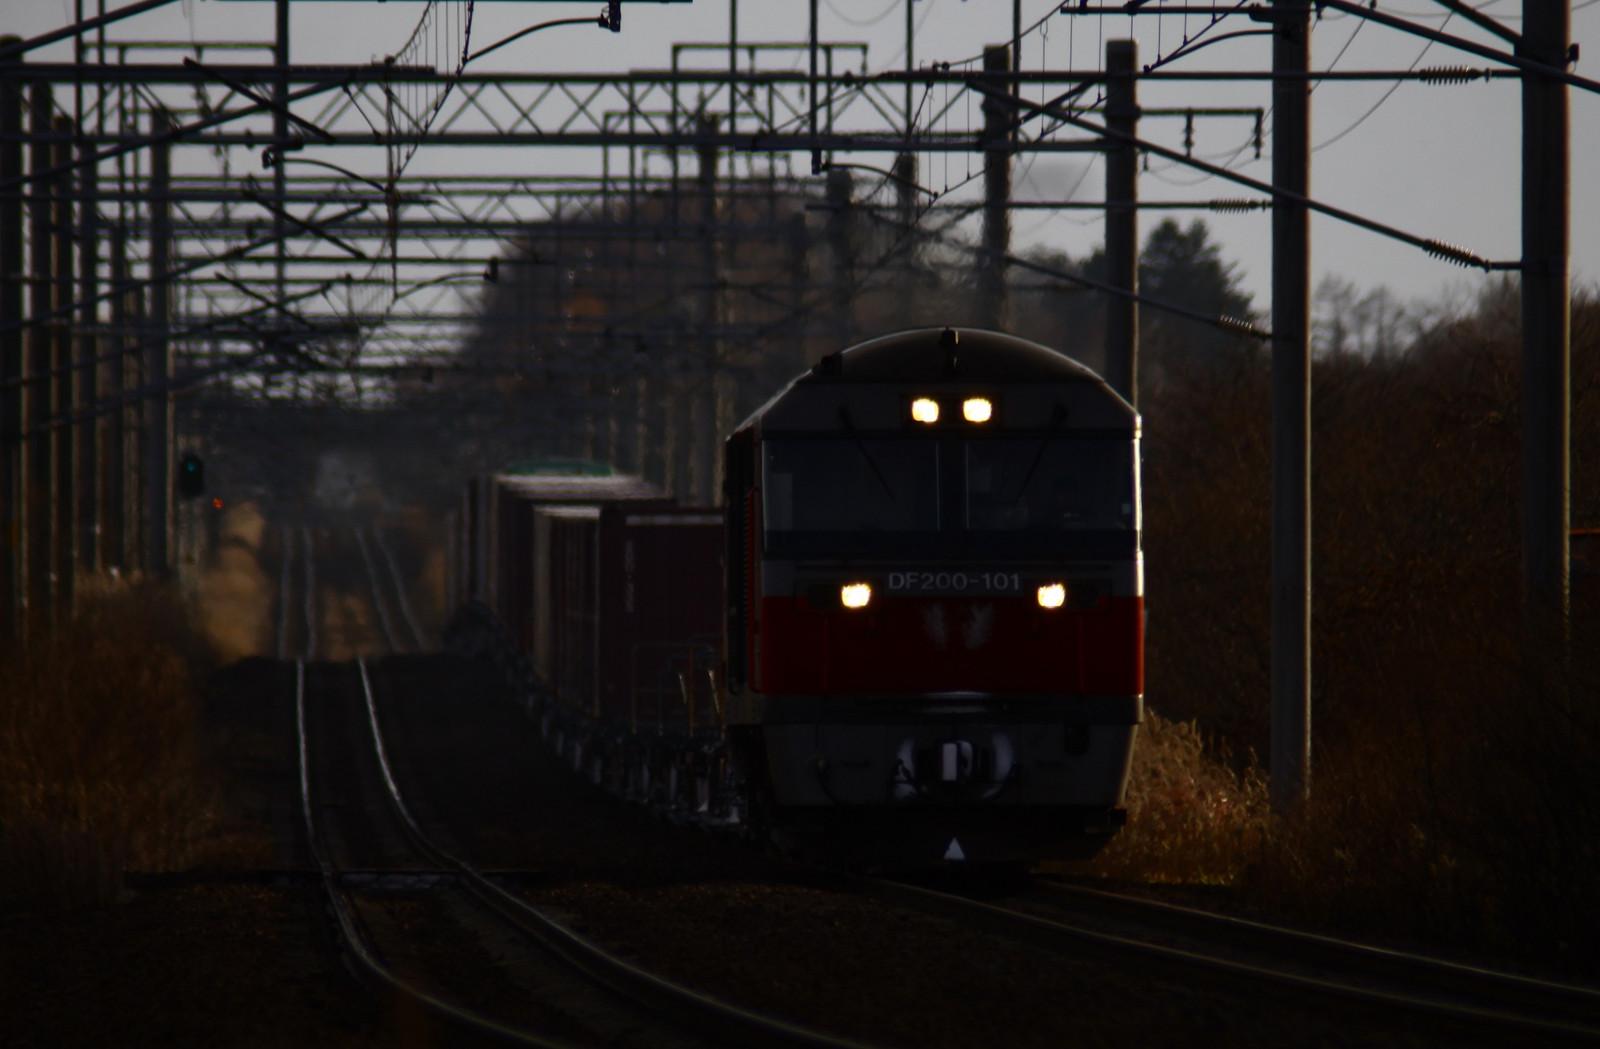 Jr1611235007